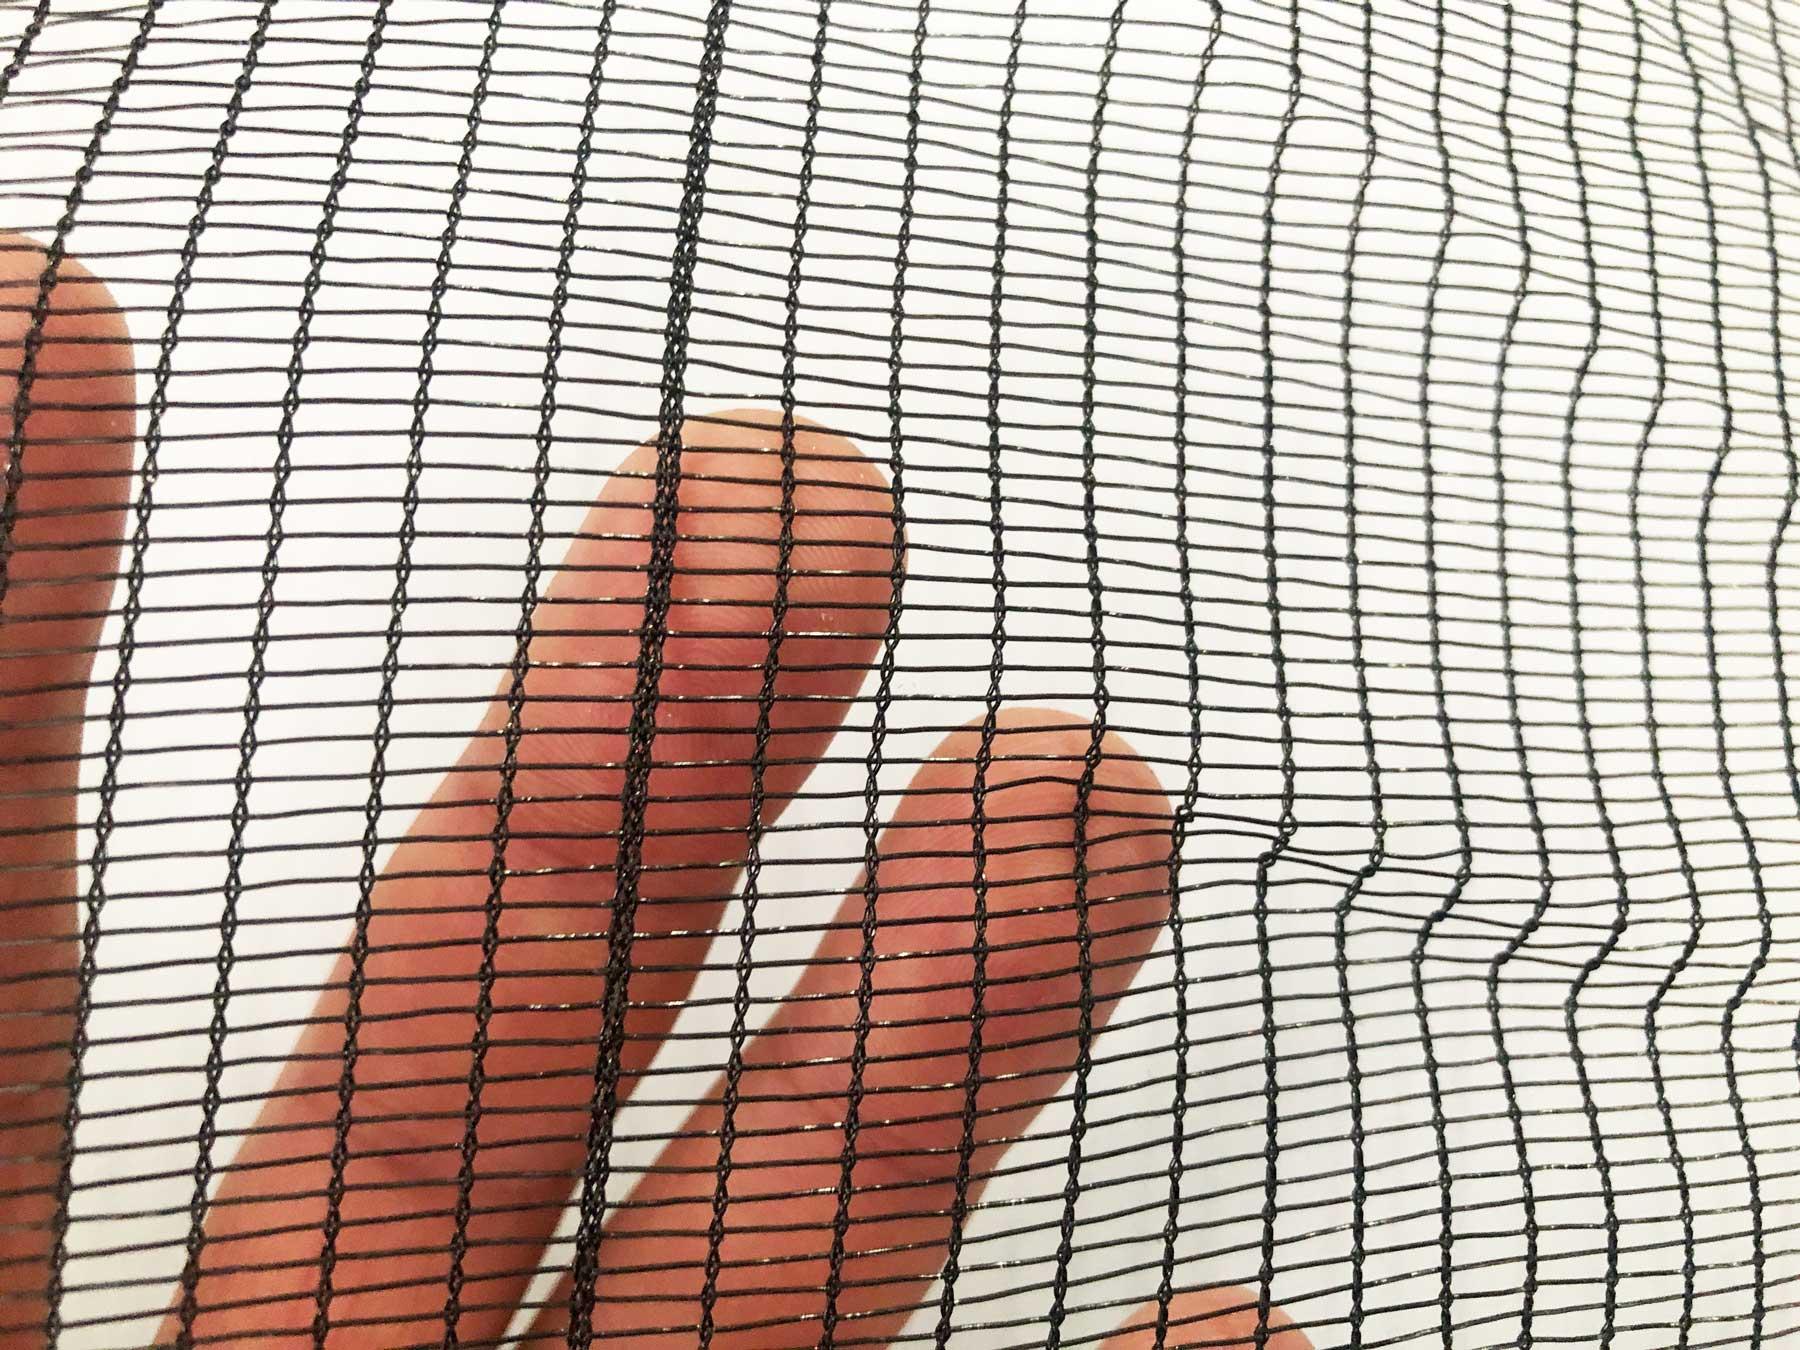 Tela Sombrite Nylon Monofilamento com Giro Inglês 50% 3x20